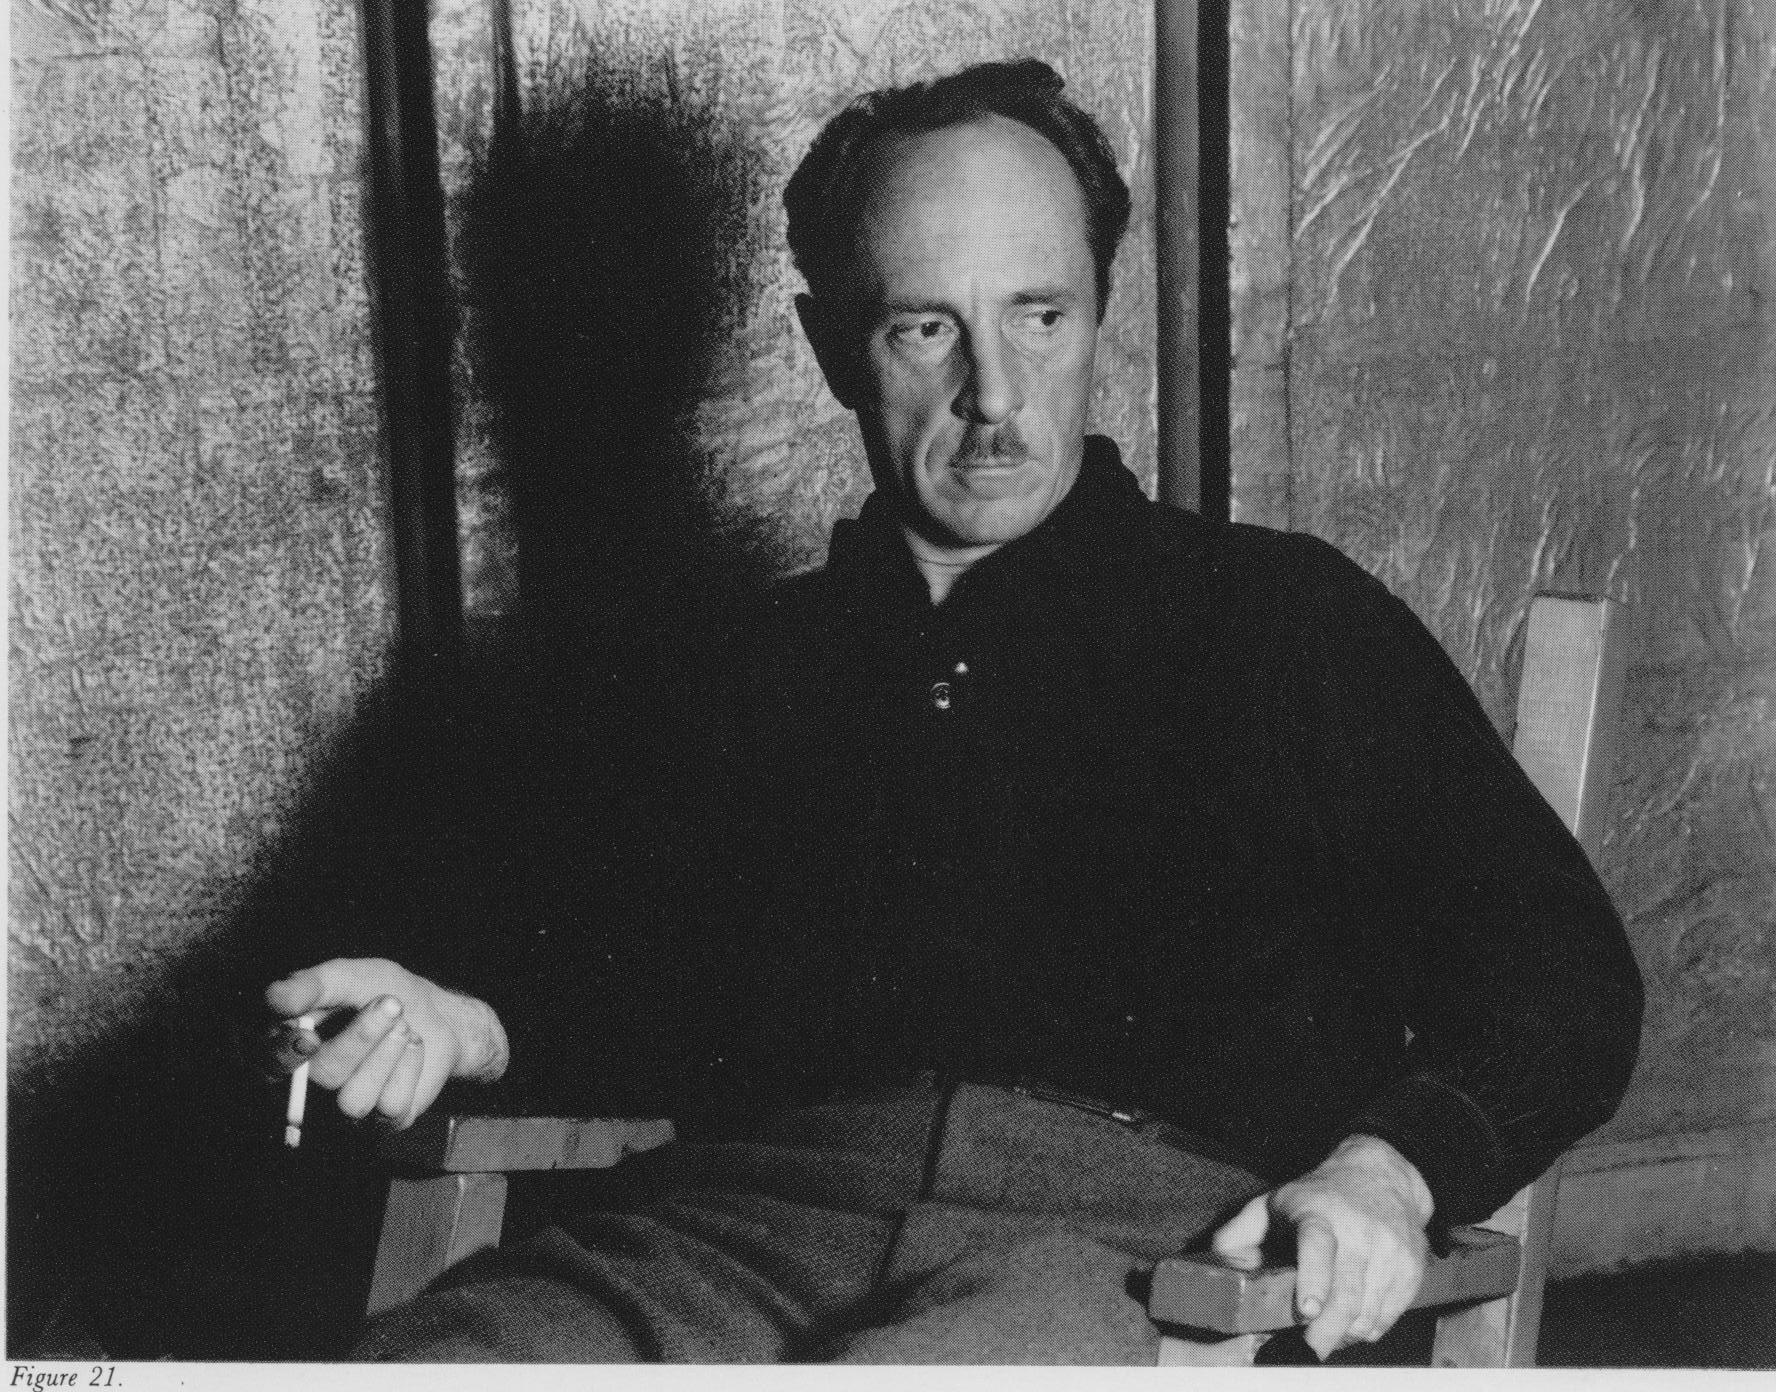 Edward Weston by Willard van Dyke